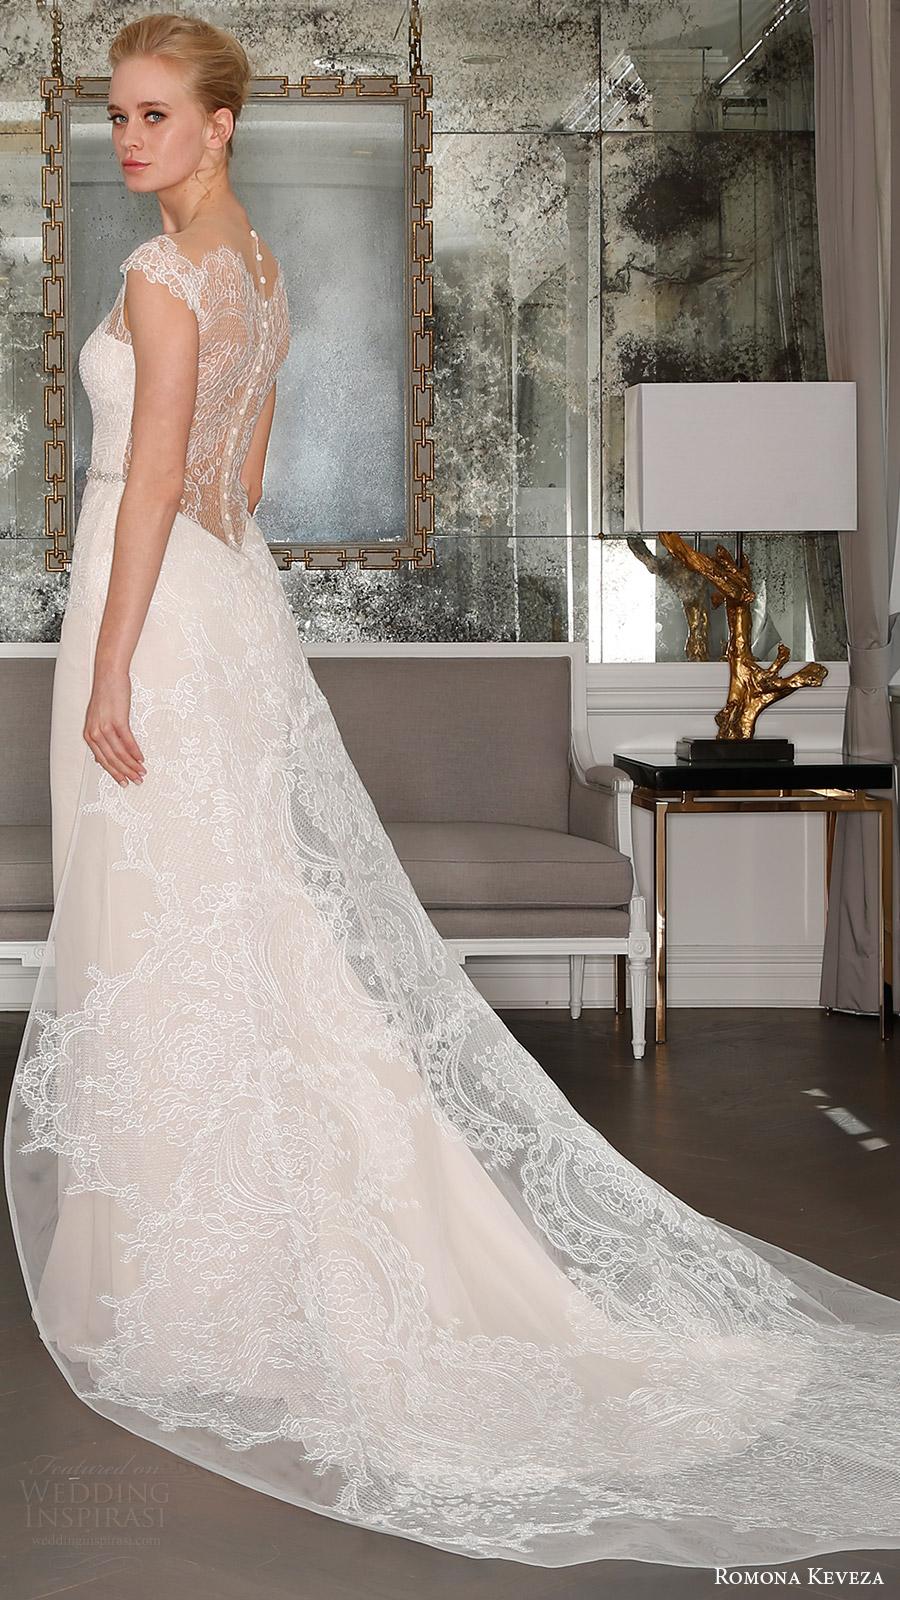 romona keveza bridal spring 2017 illusion cap sleeves sweetheart deep vneck sheath wedding dress (rk7405) bv sheer back detachable train